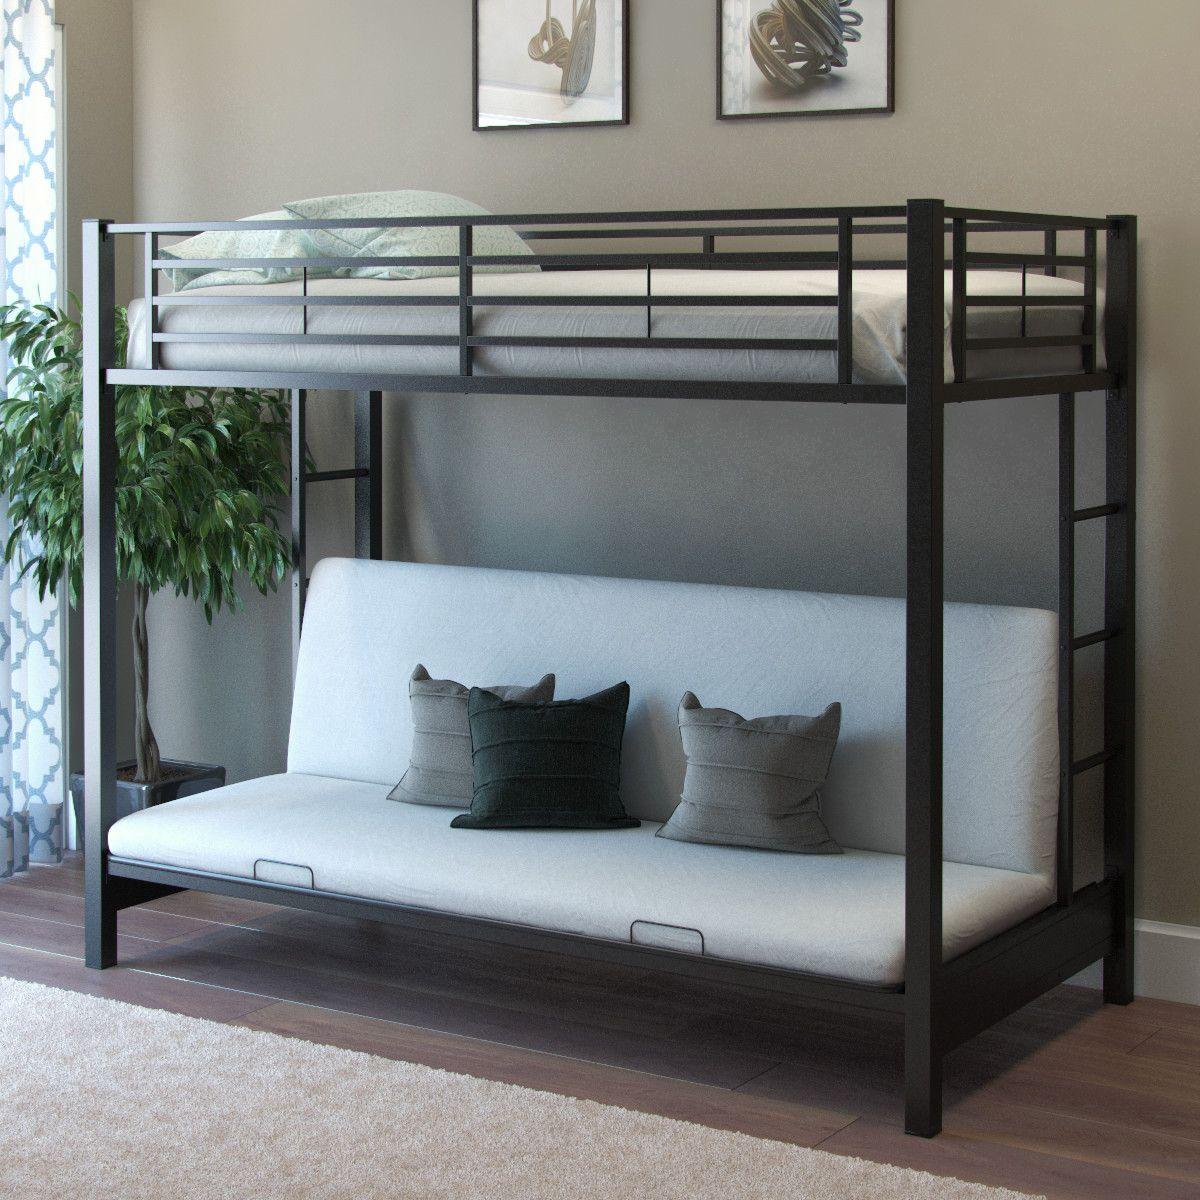 gibson living monty twin over futon standard bunk bed gibson living monty twin over futon standard bunk bed      rh   pinterest